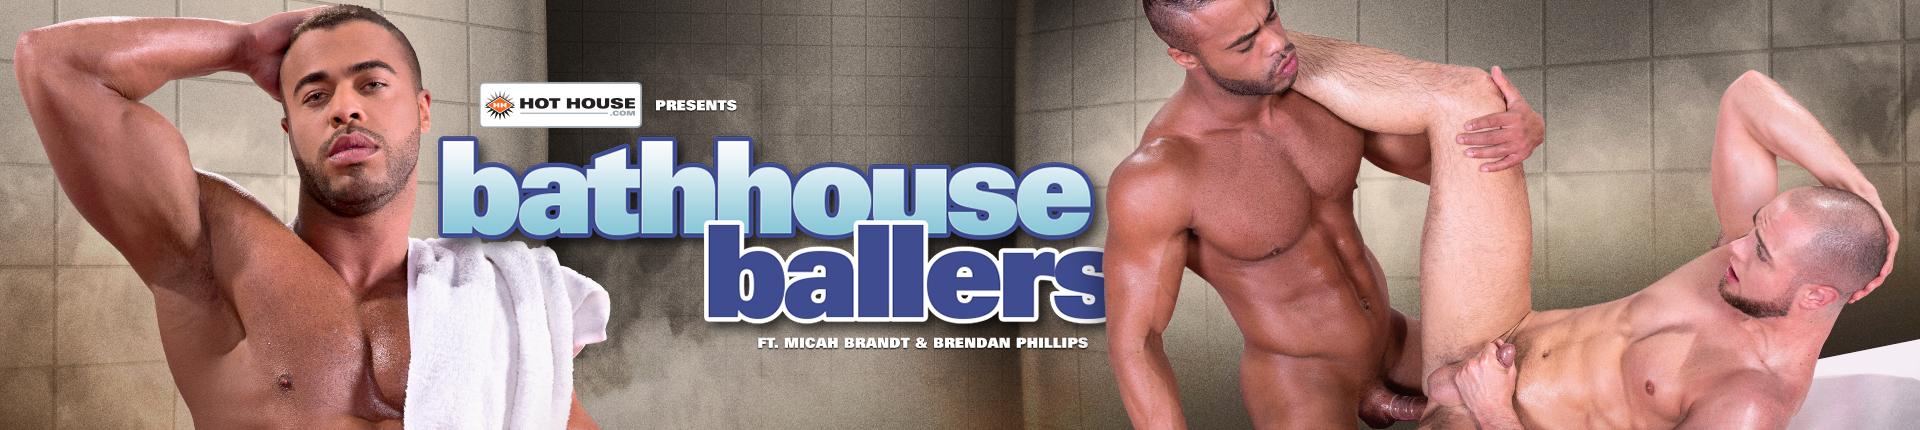 Bathhouse_ballers